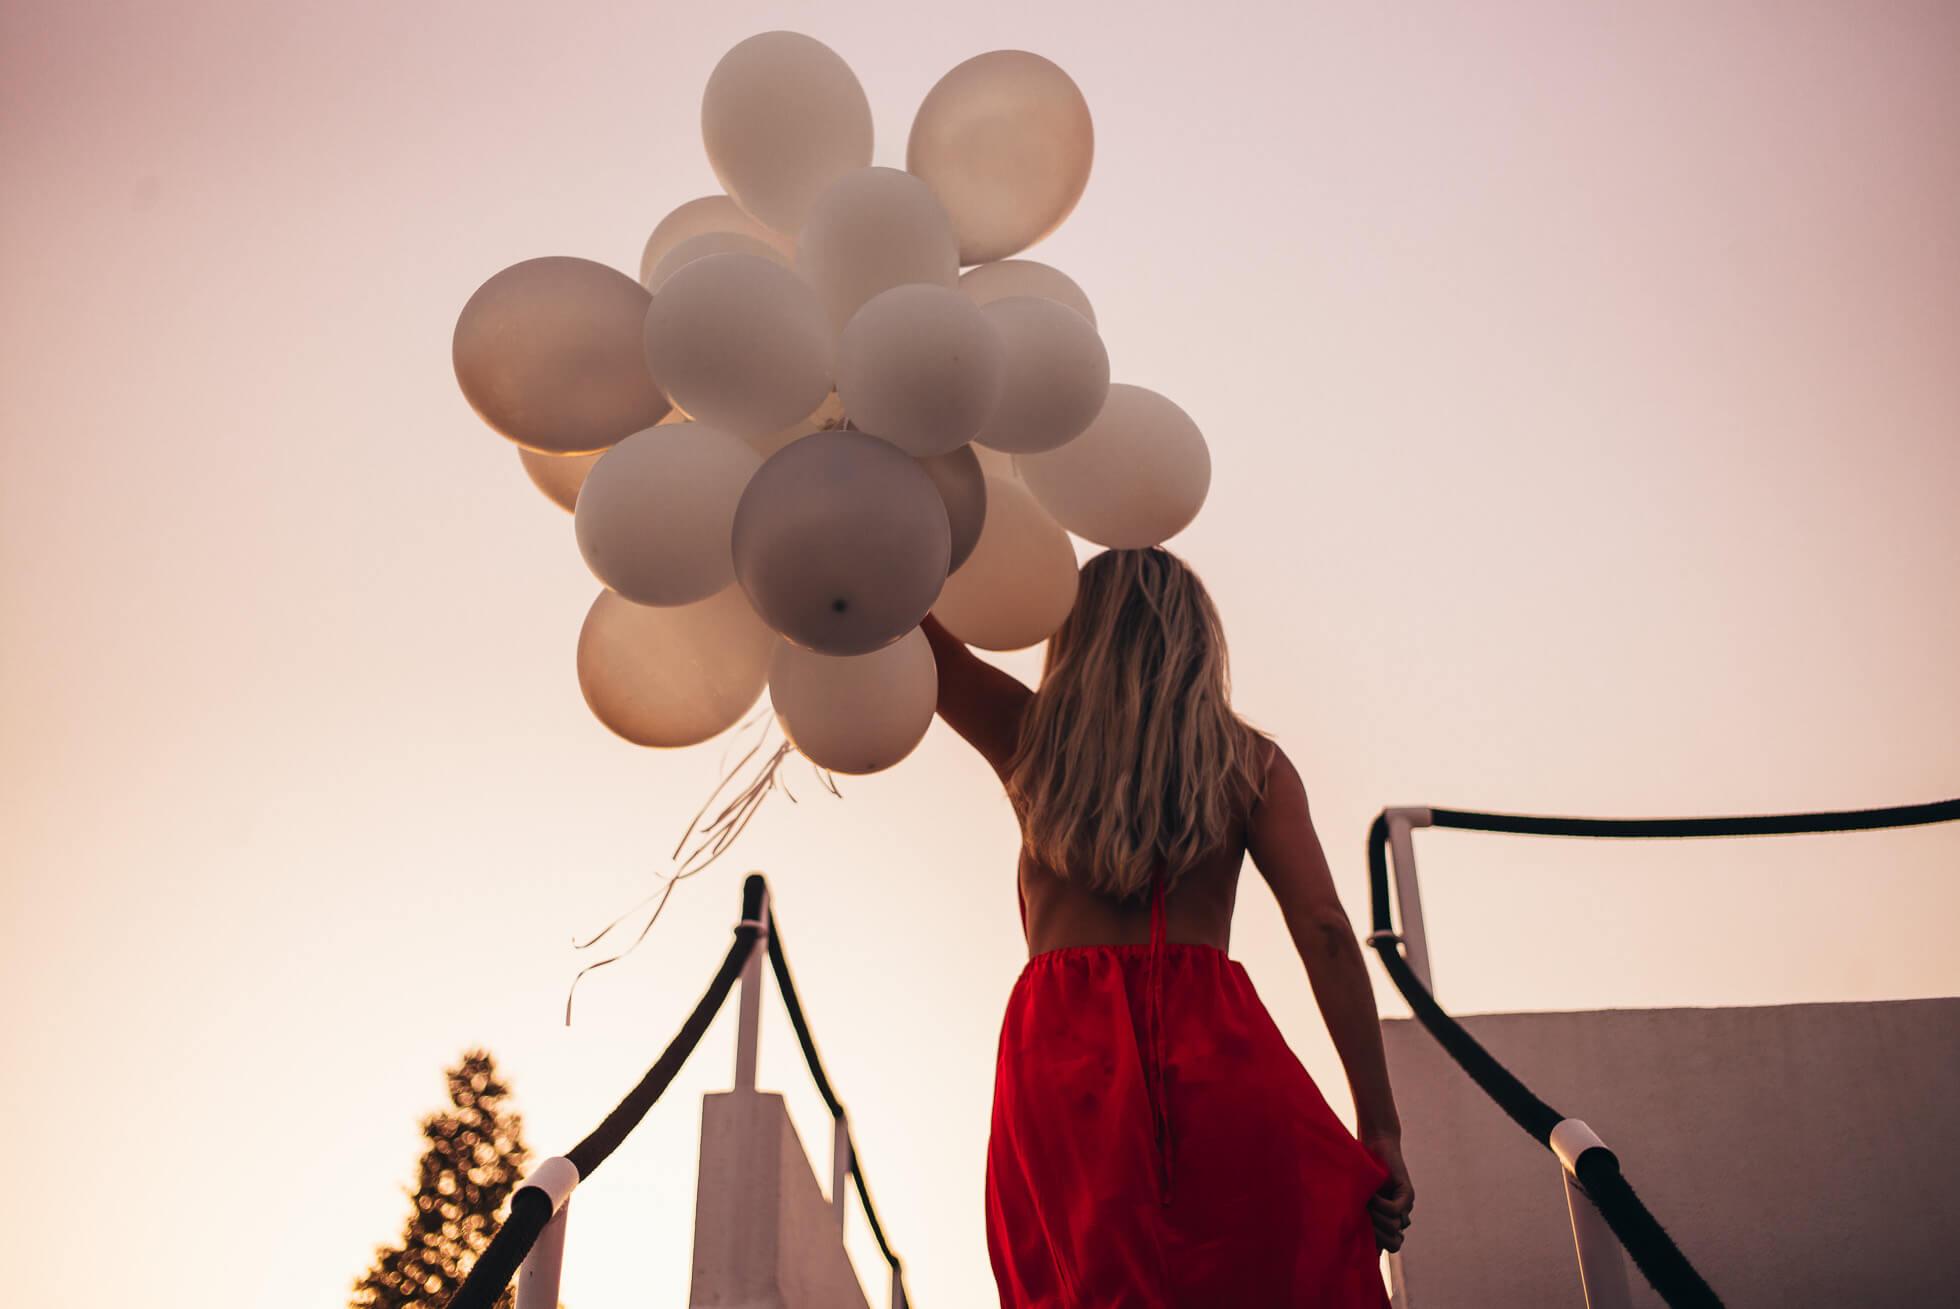 janni-deler-balloon-marbellal1002378